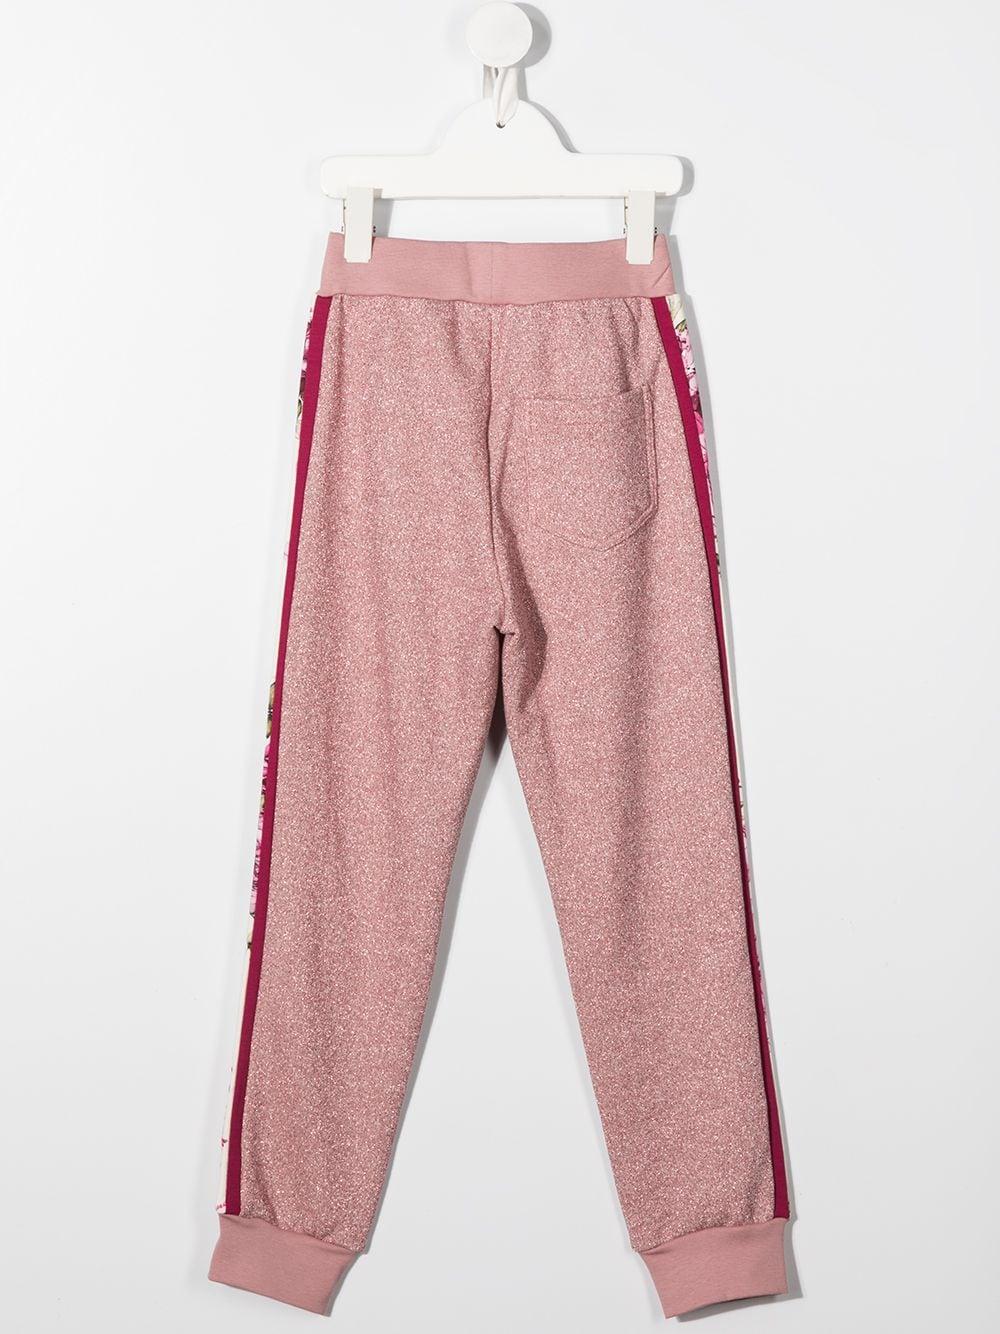 pantaloni felpa con banda laterale MONNALISA | Pantaloni | 196402R56002092C